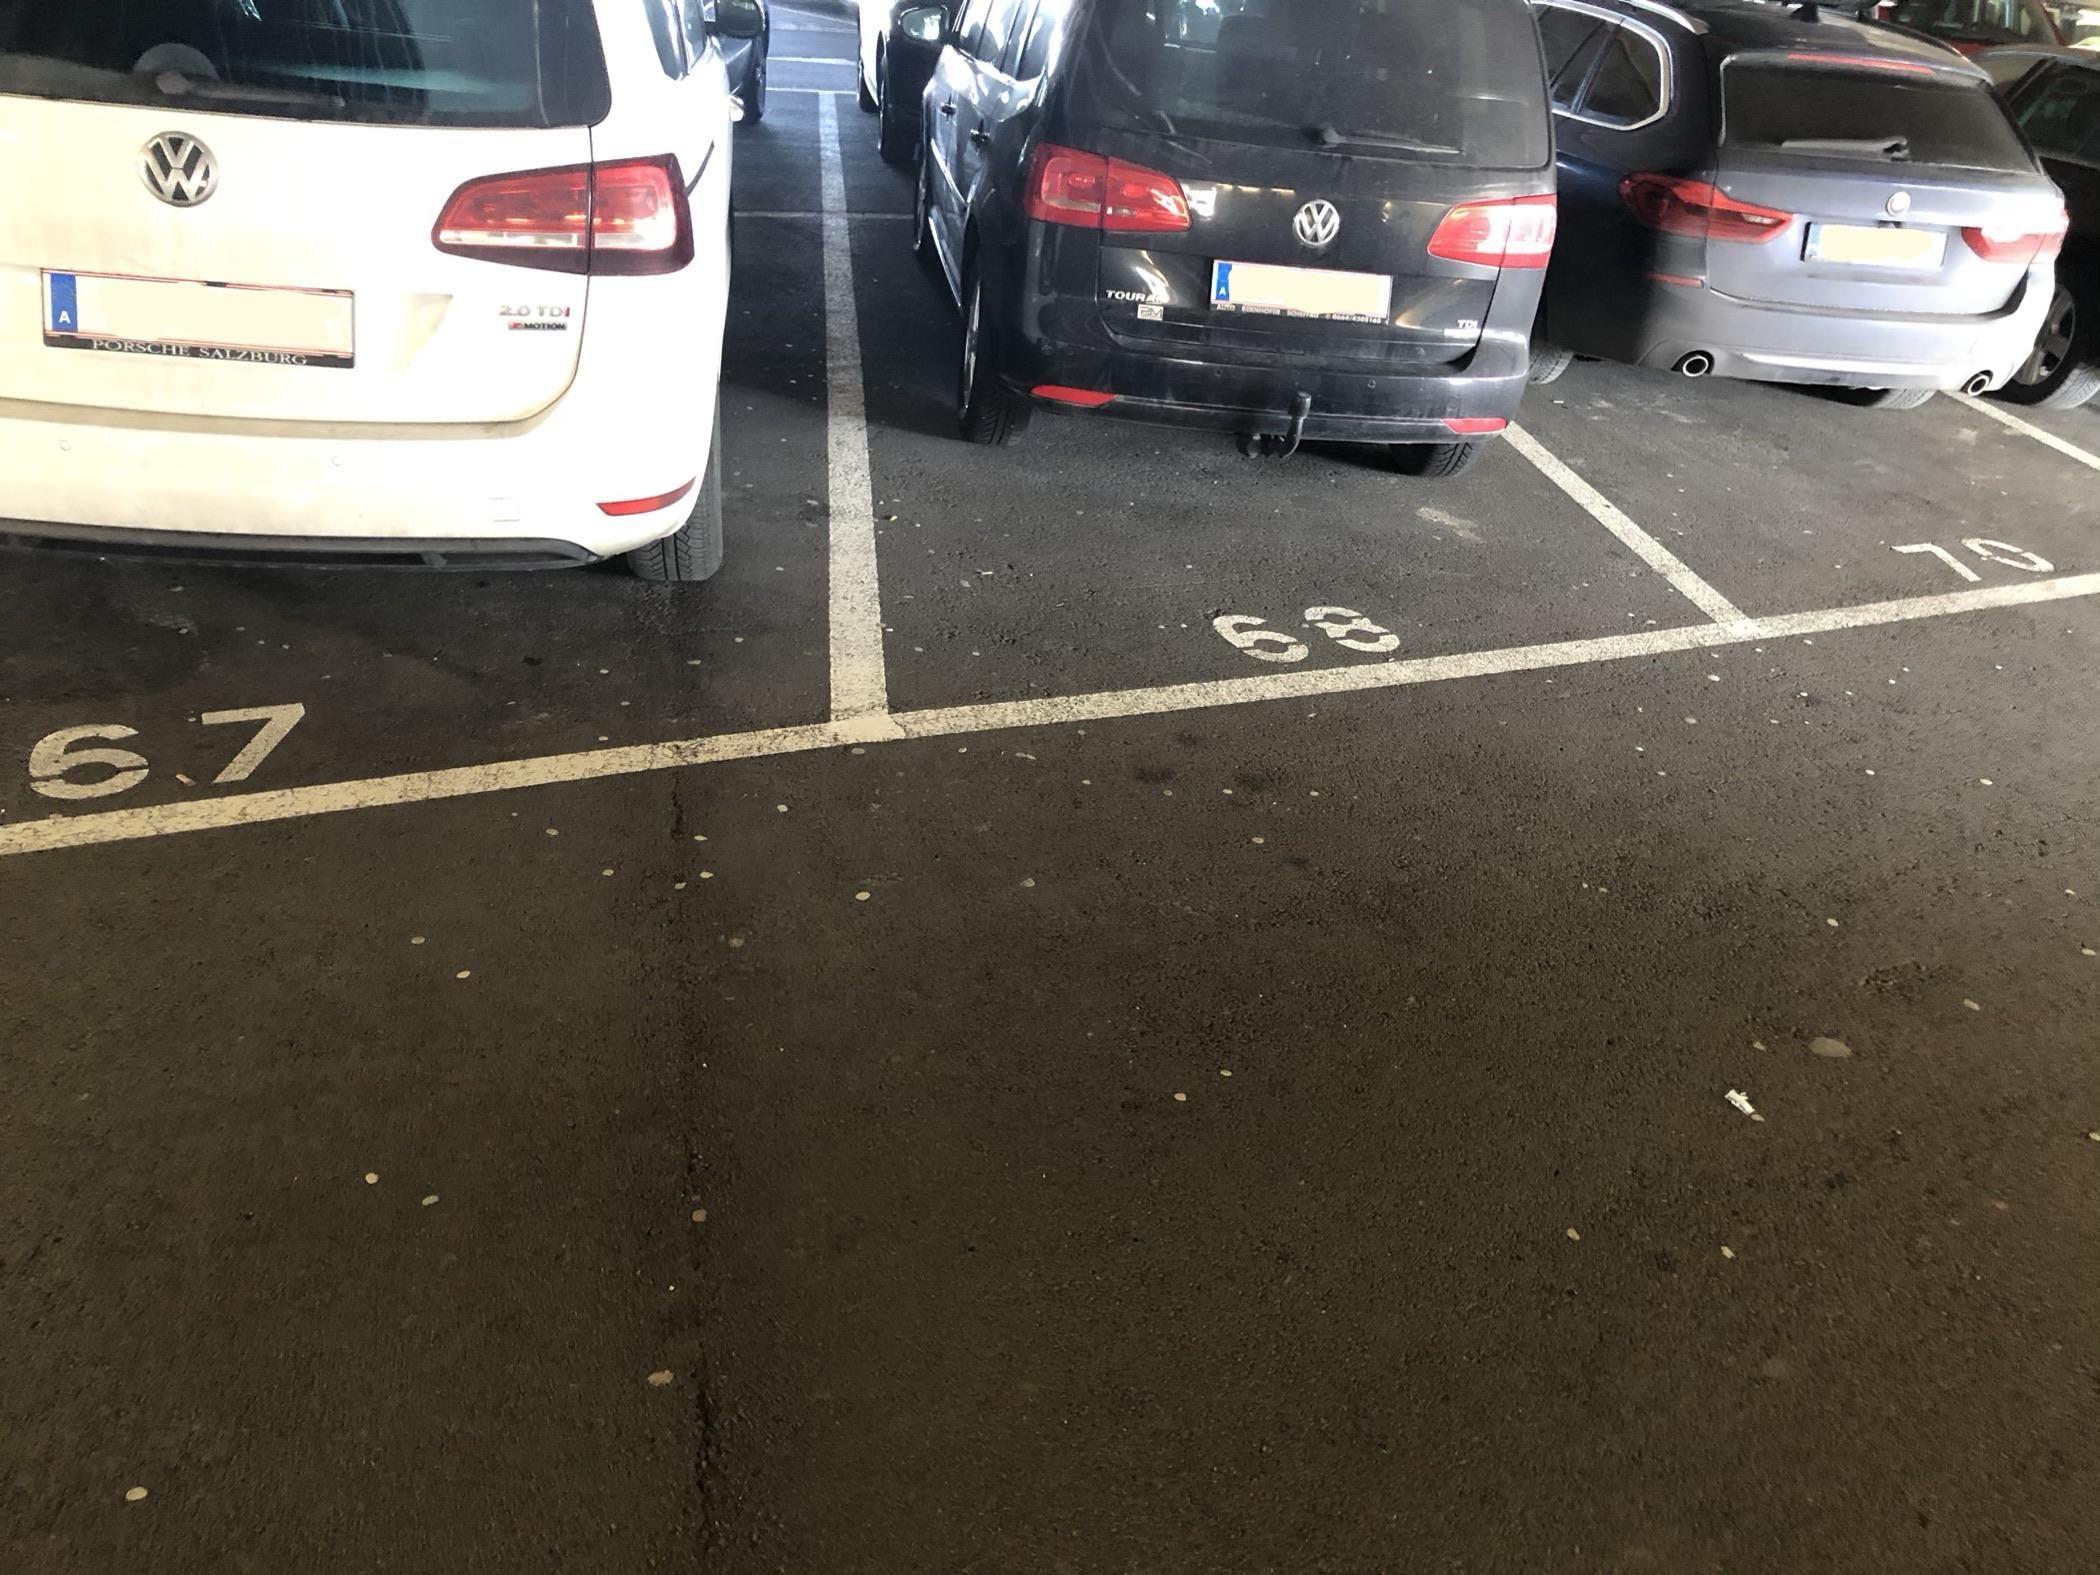 Austria, where even the car parks have no fun